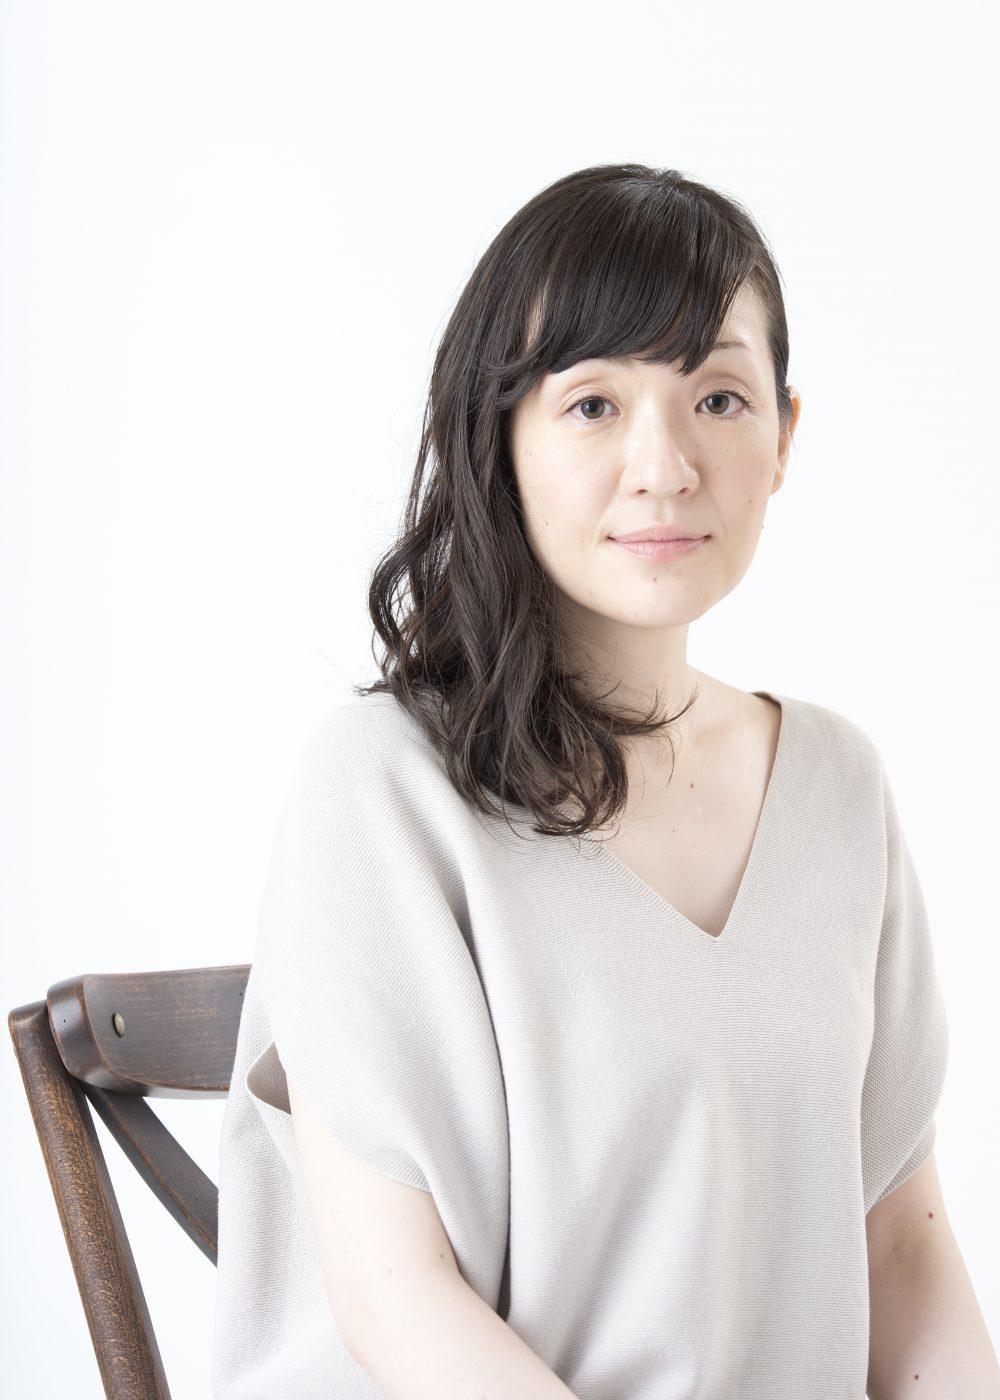 Murata-Sayaka-credit-Bungeishunju-Ltd1-e1535420129960.jpg